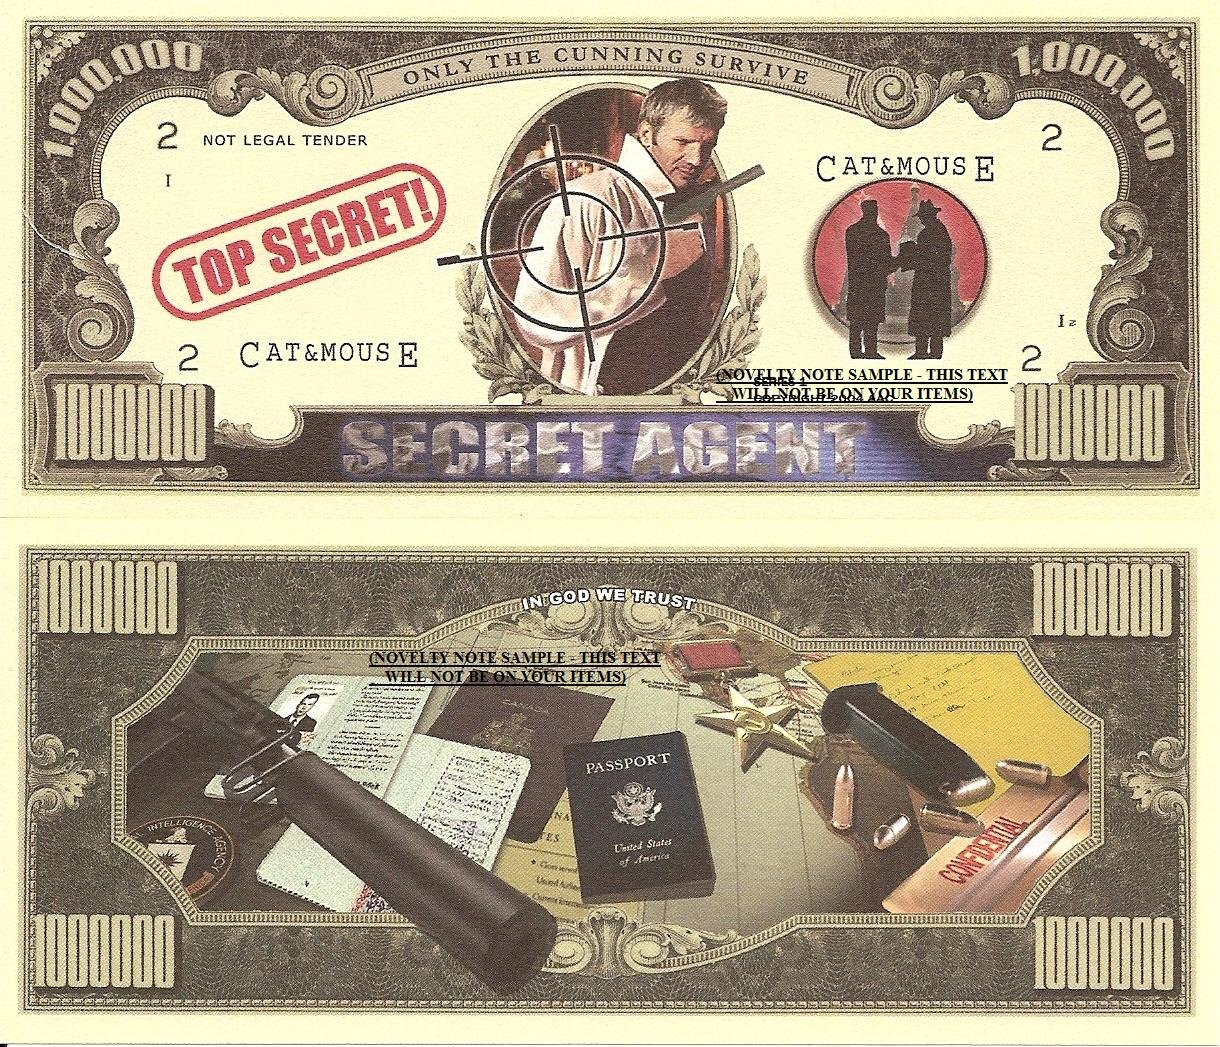 Secret Agent Spy Top Secret Million Dollar Bills x 4 Only the Cunning Survive